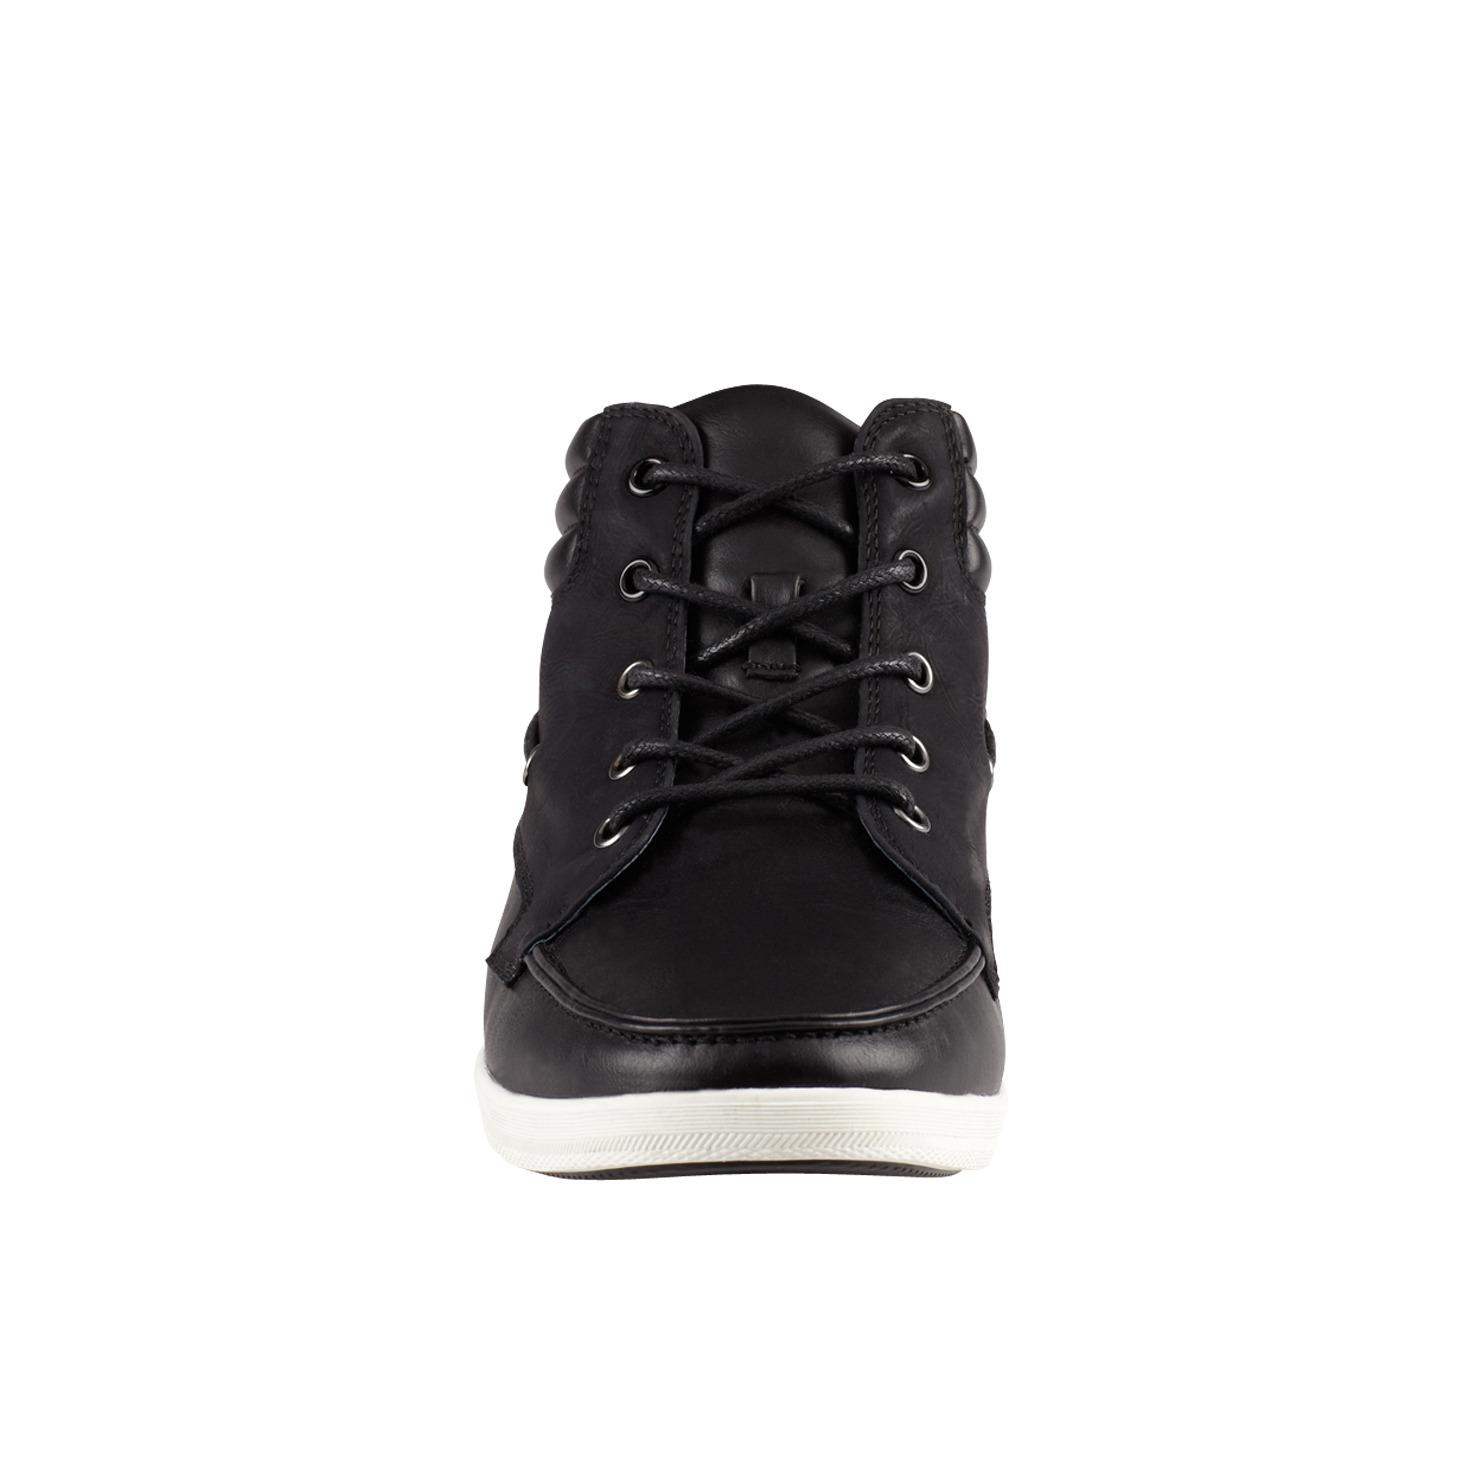 Vaywen Aldo Shoes Men